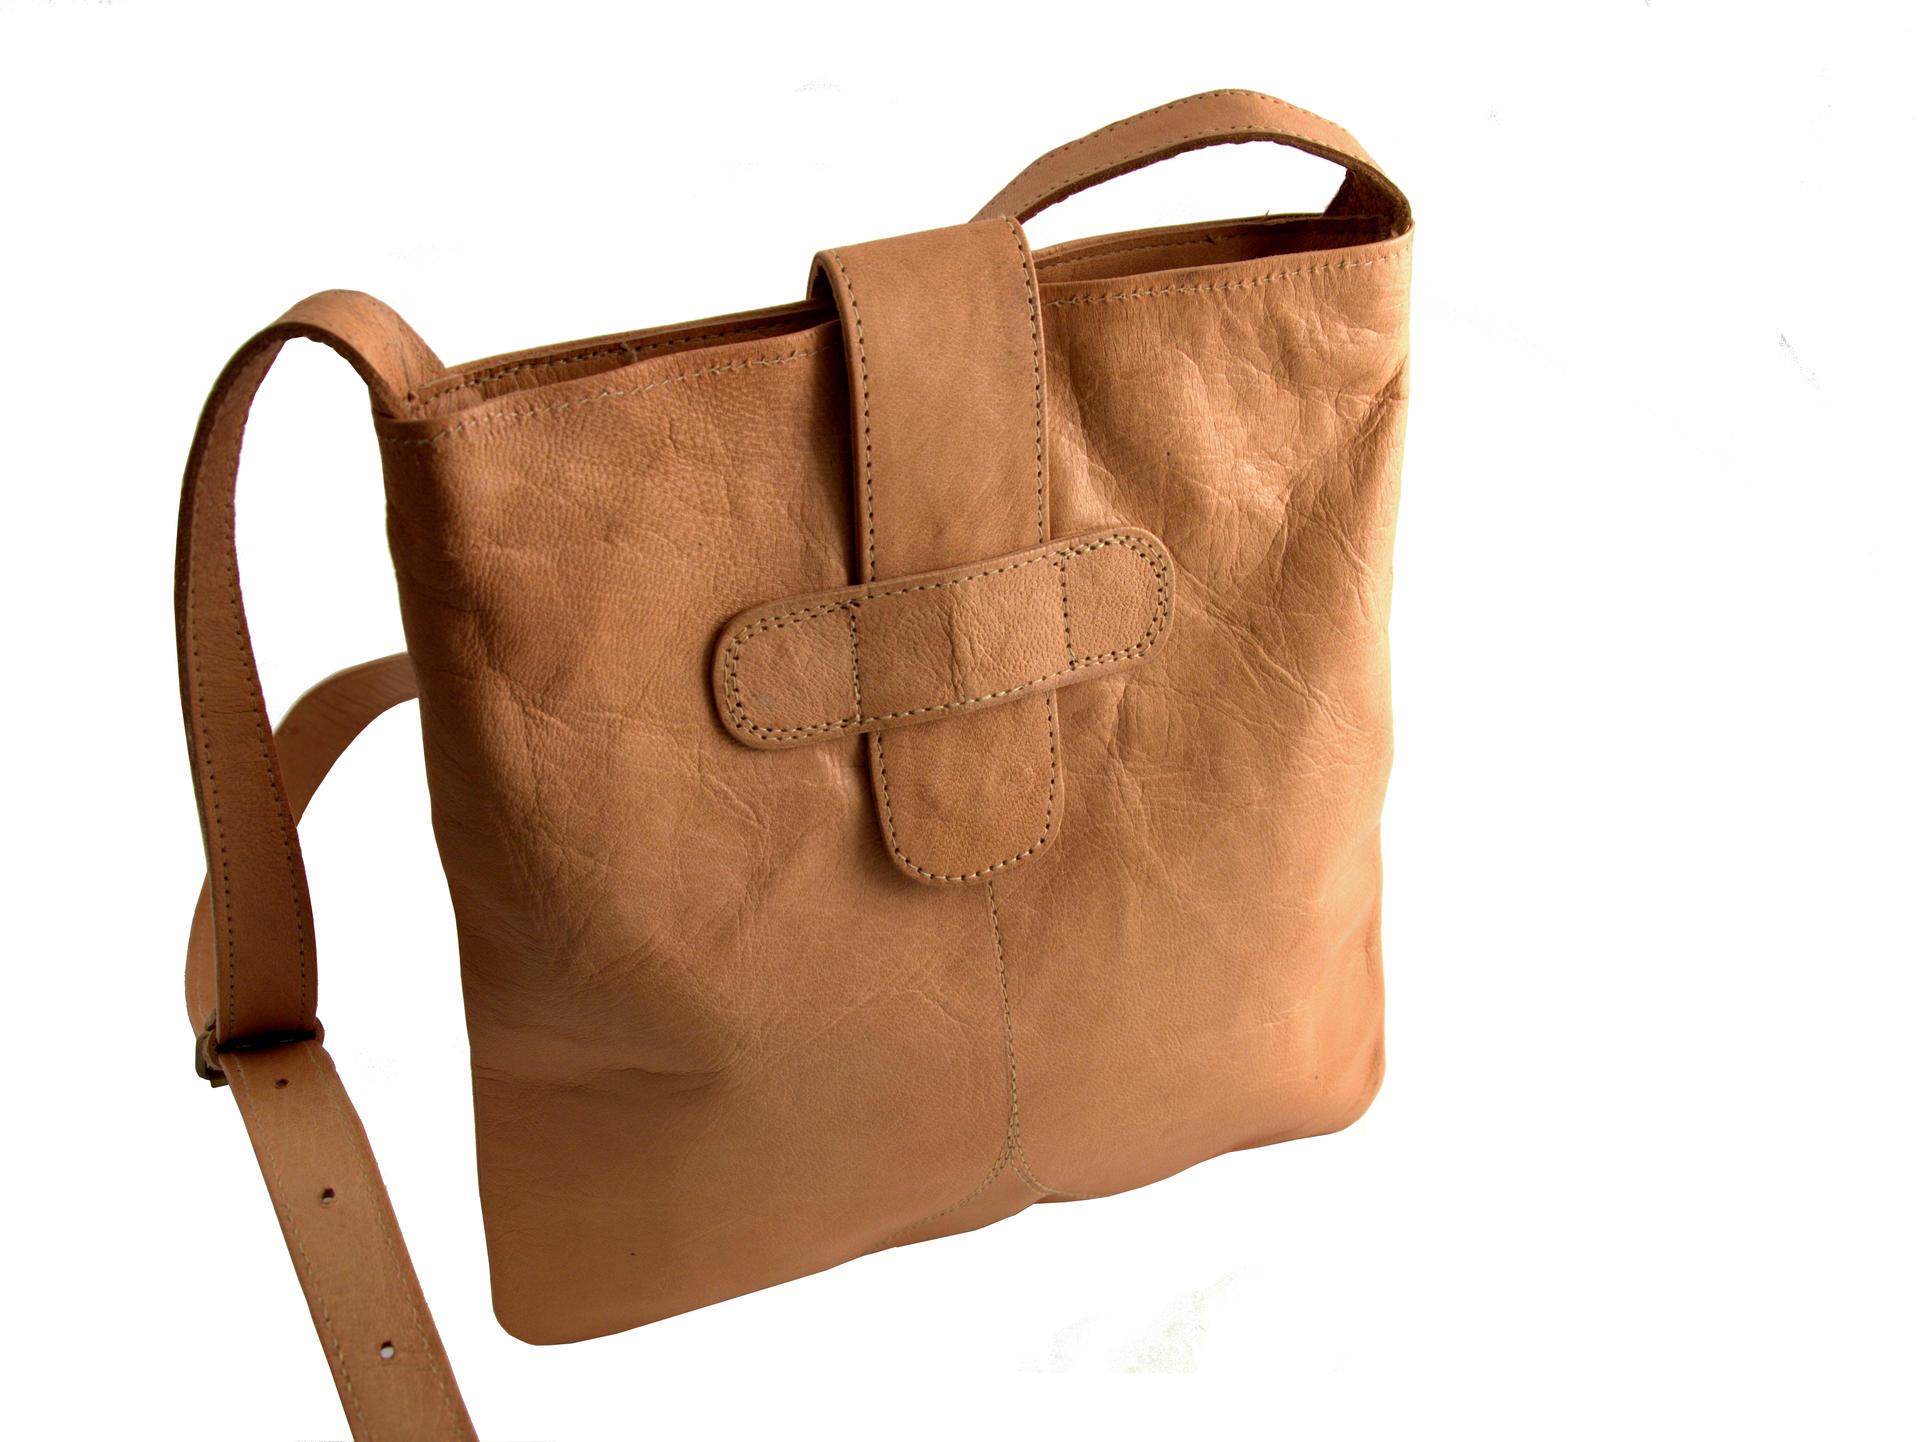 Gundara - small shoulder bag Selma - Afghanistan - genuine leather